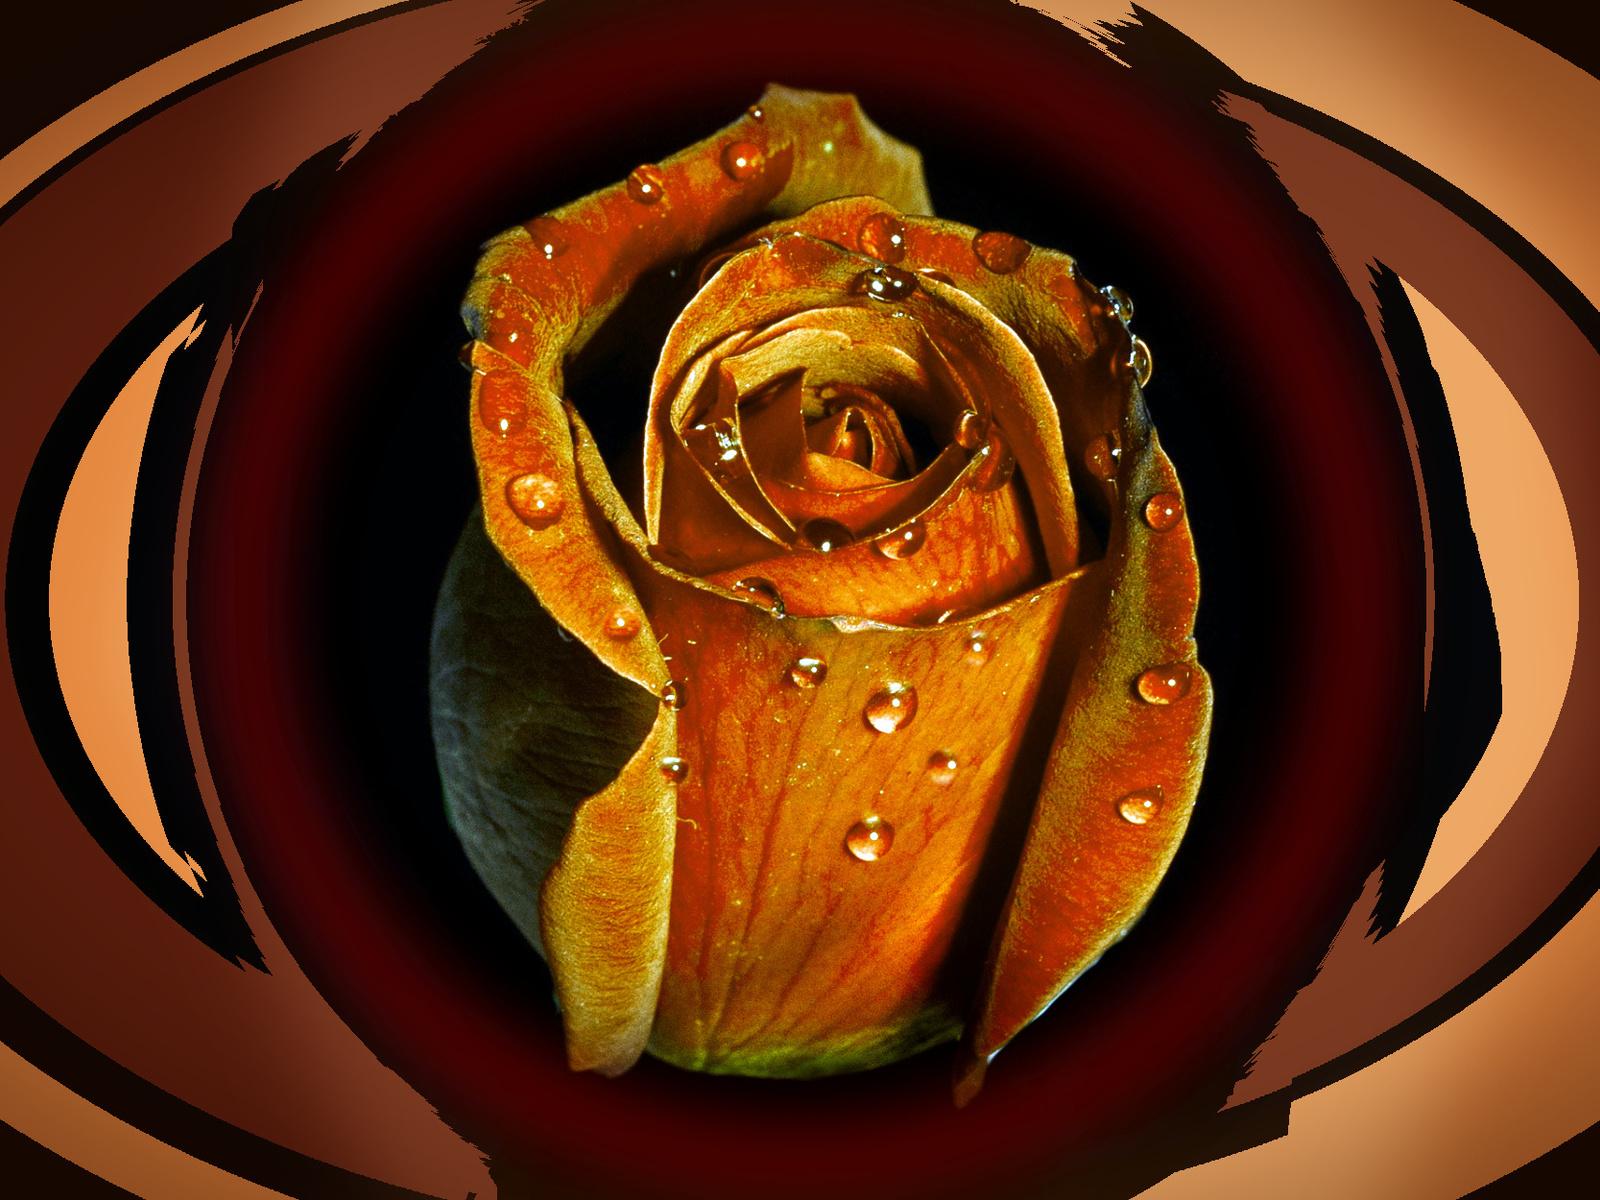 роза, капли, фон